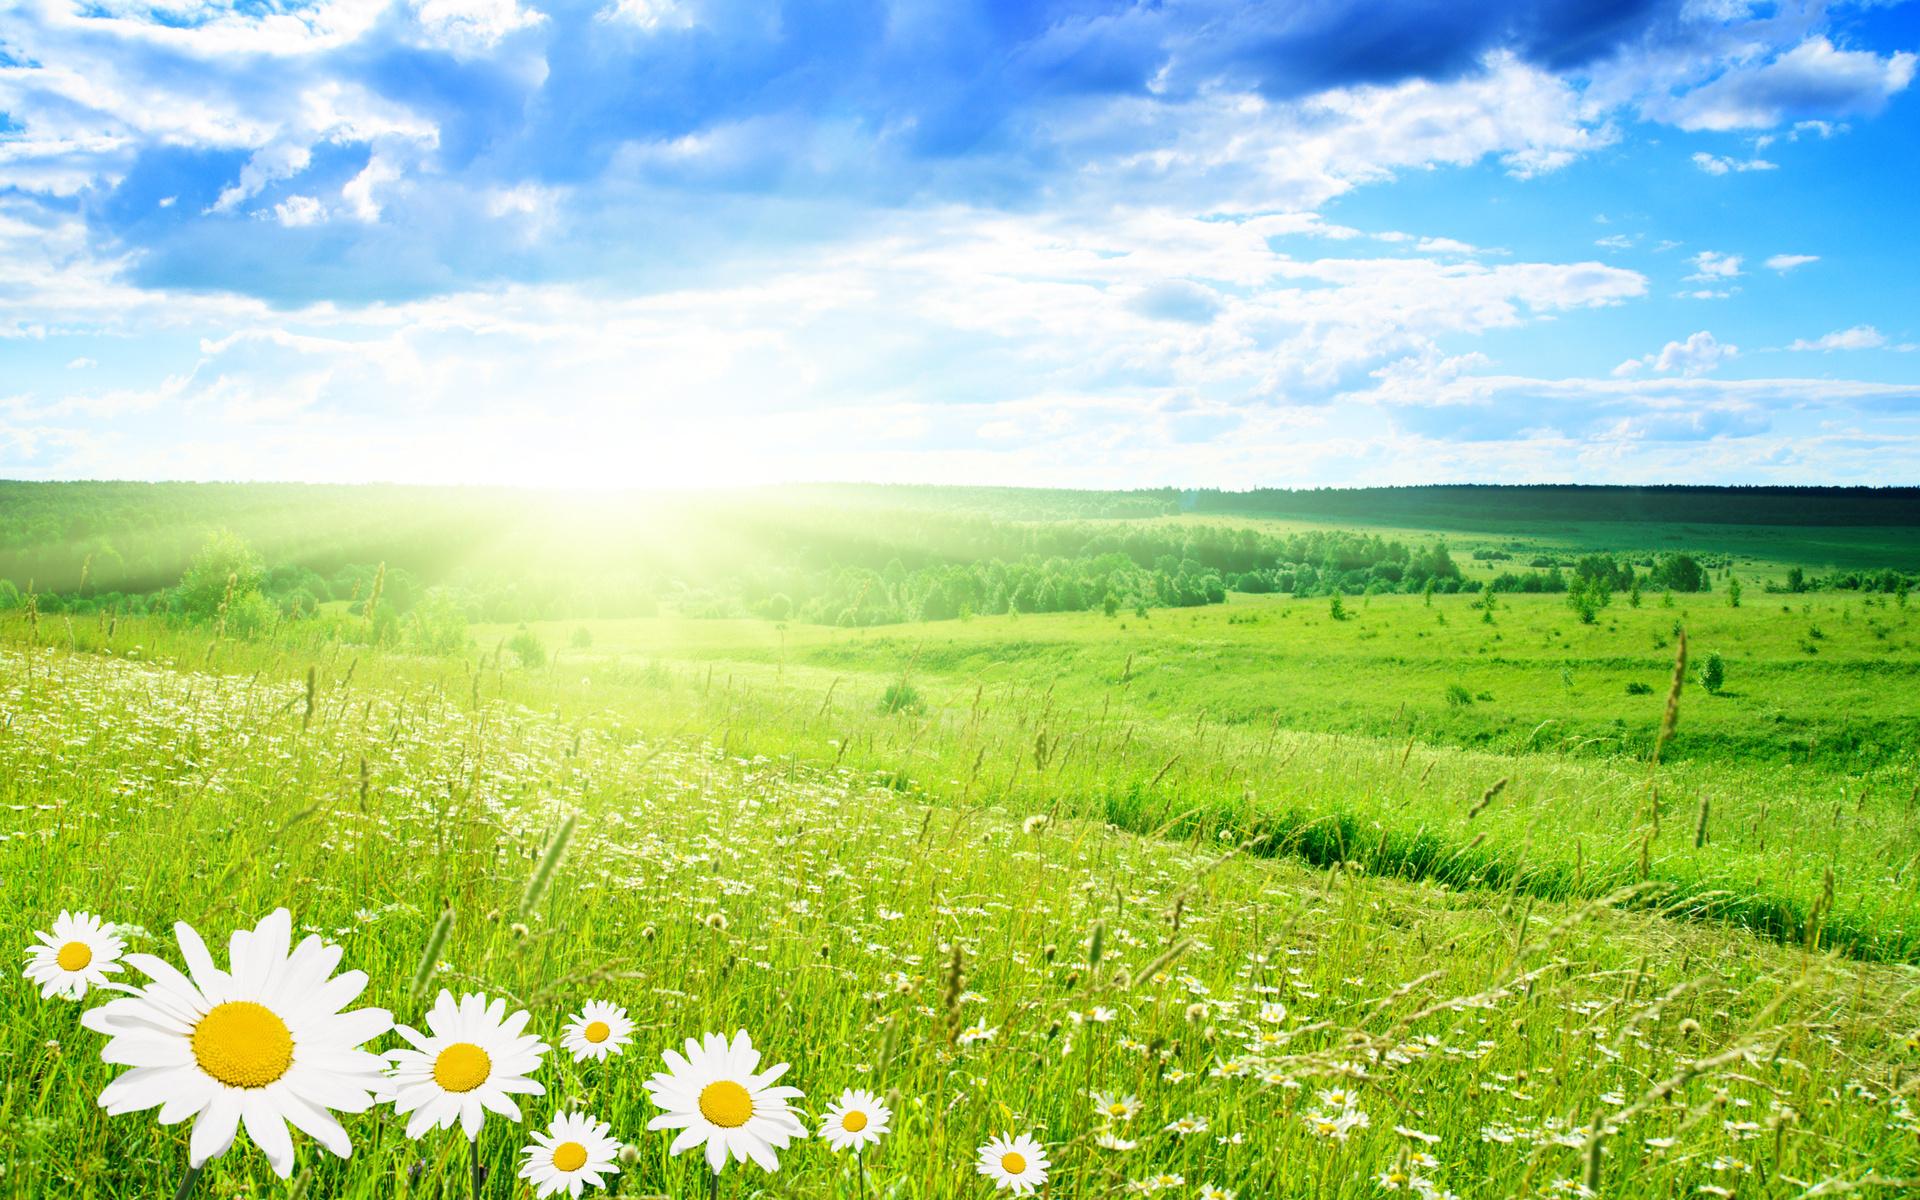 155683 pole romashka zelen leto 1920x1200 www gdefon ru